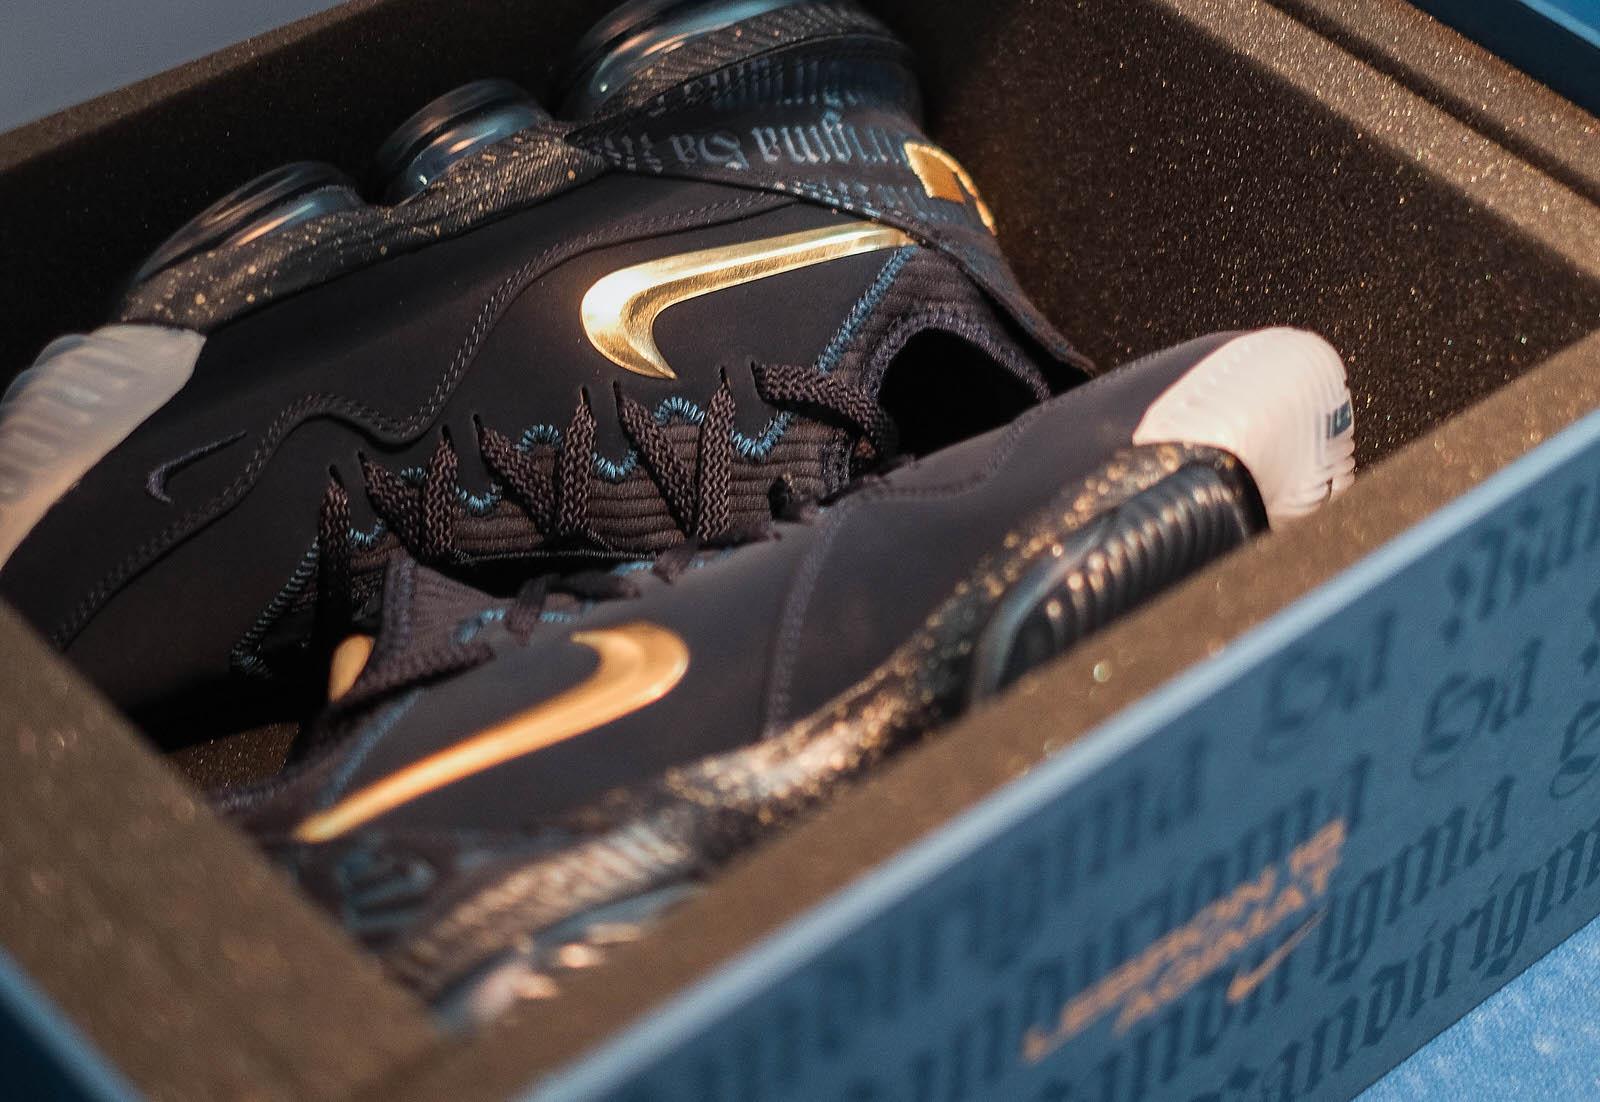 Filipino brand to team up with Nike